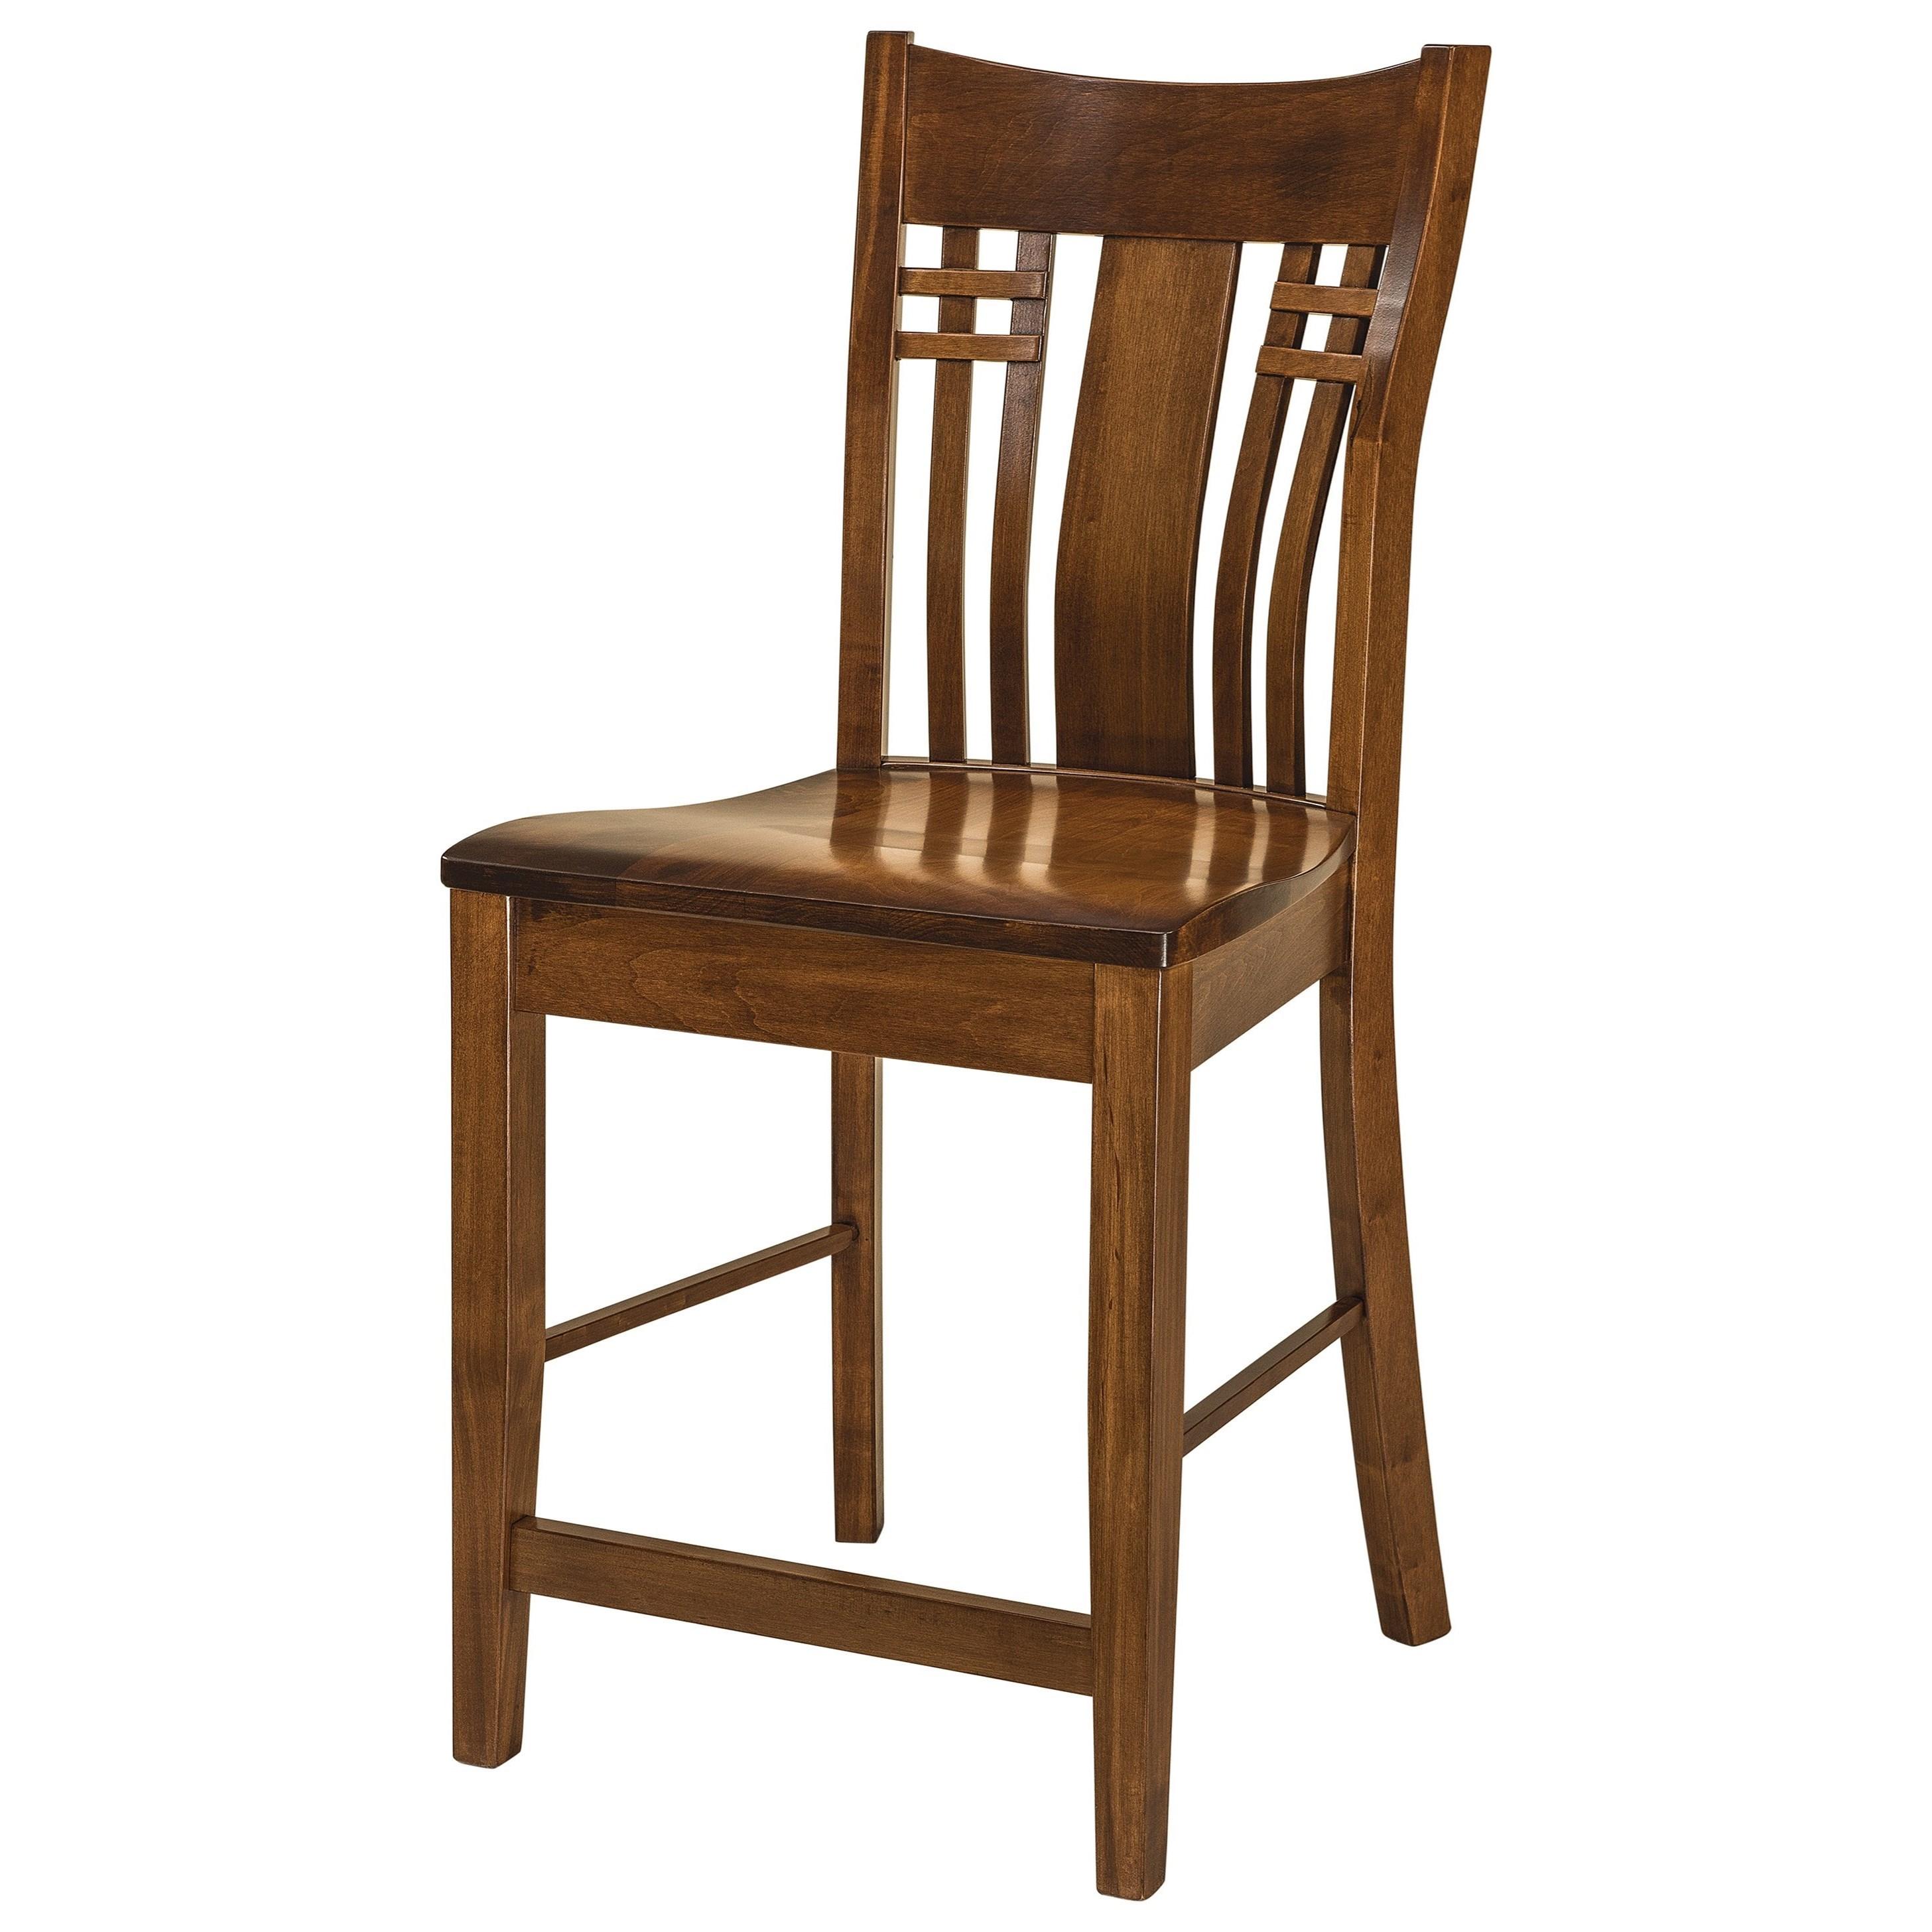 Stationary Bar Stool - Wood Seat